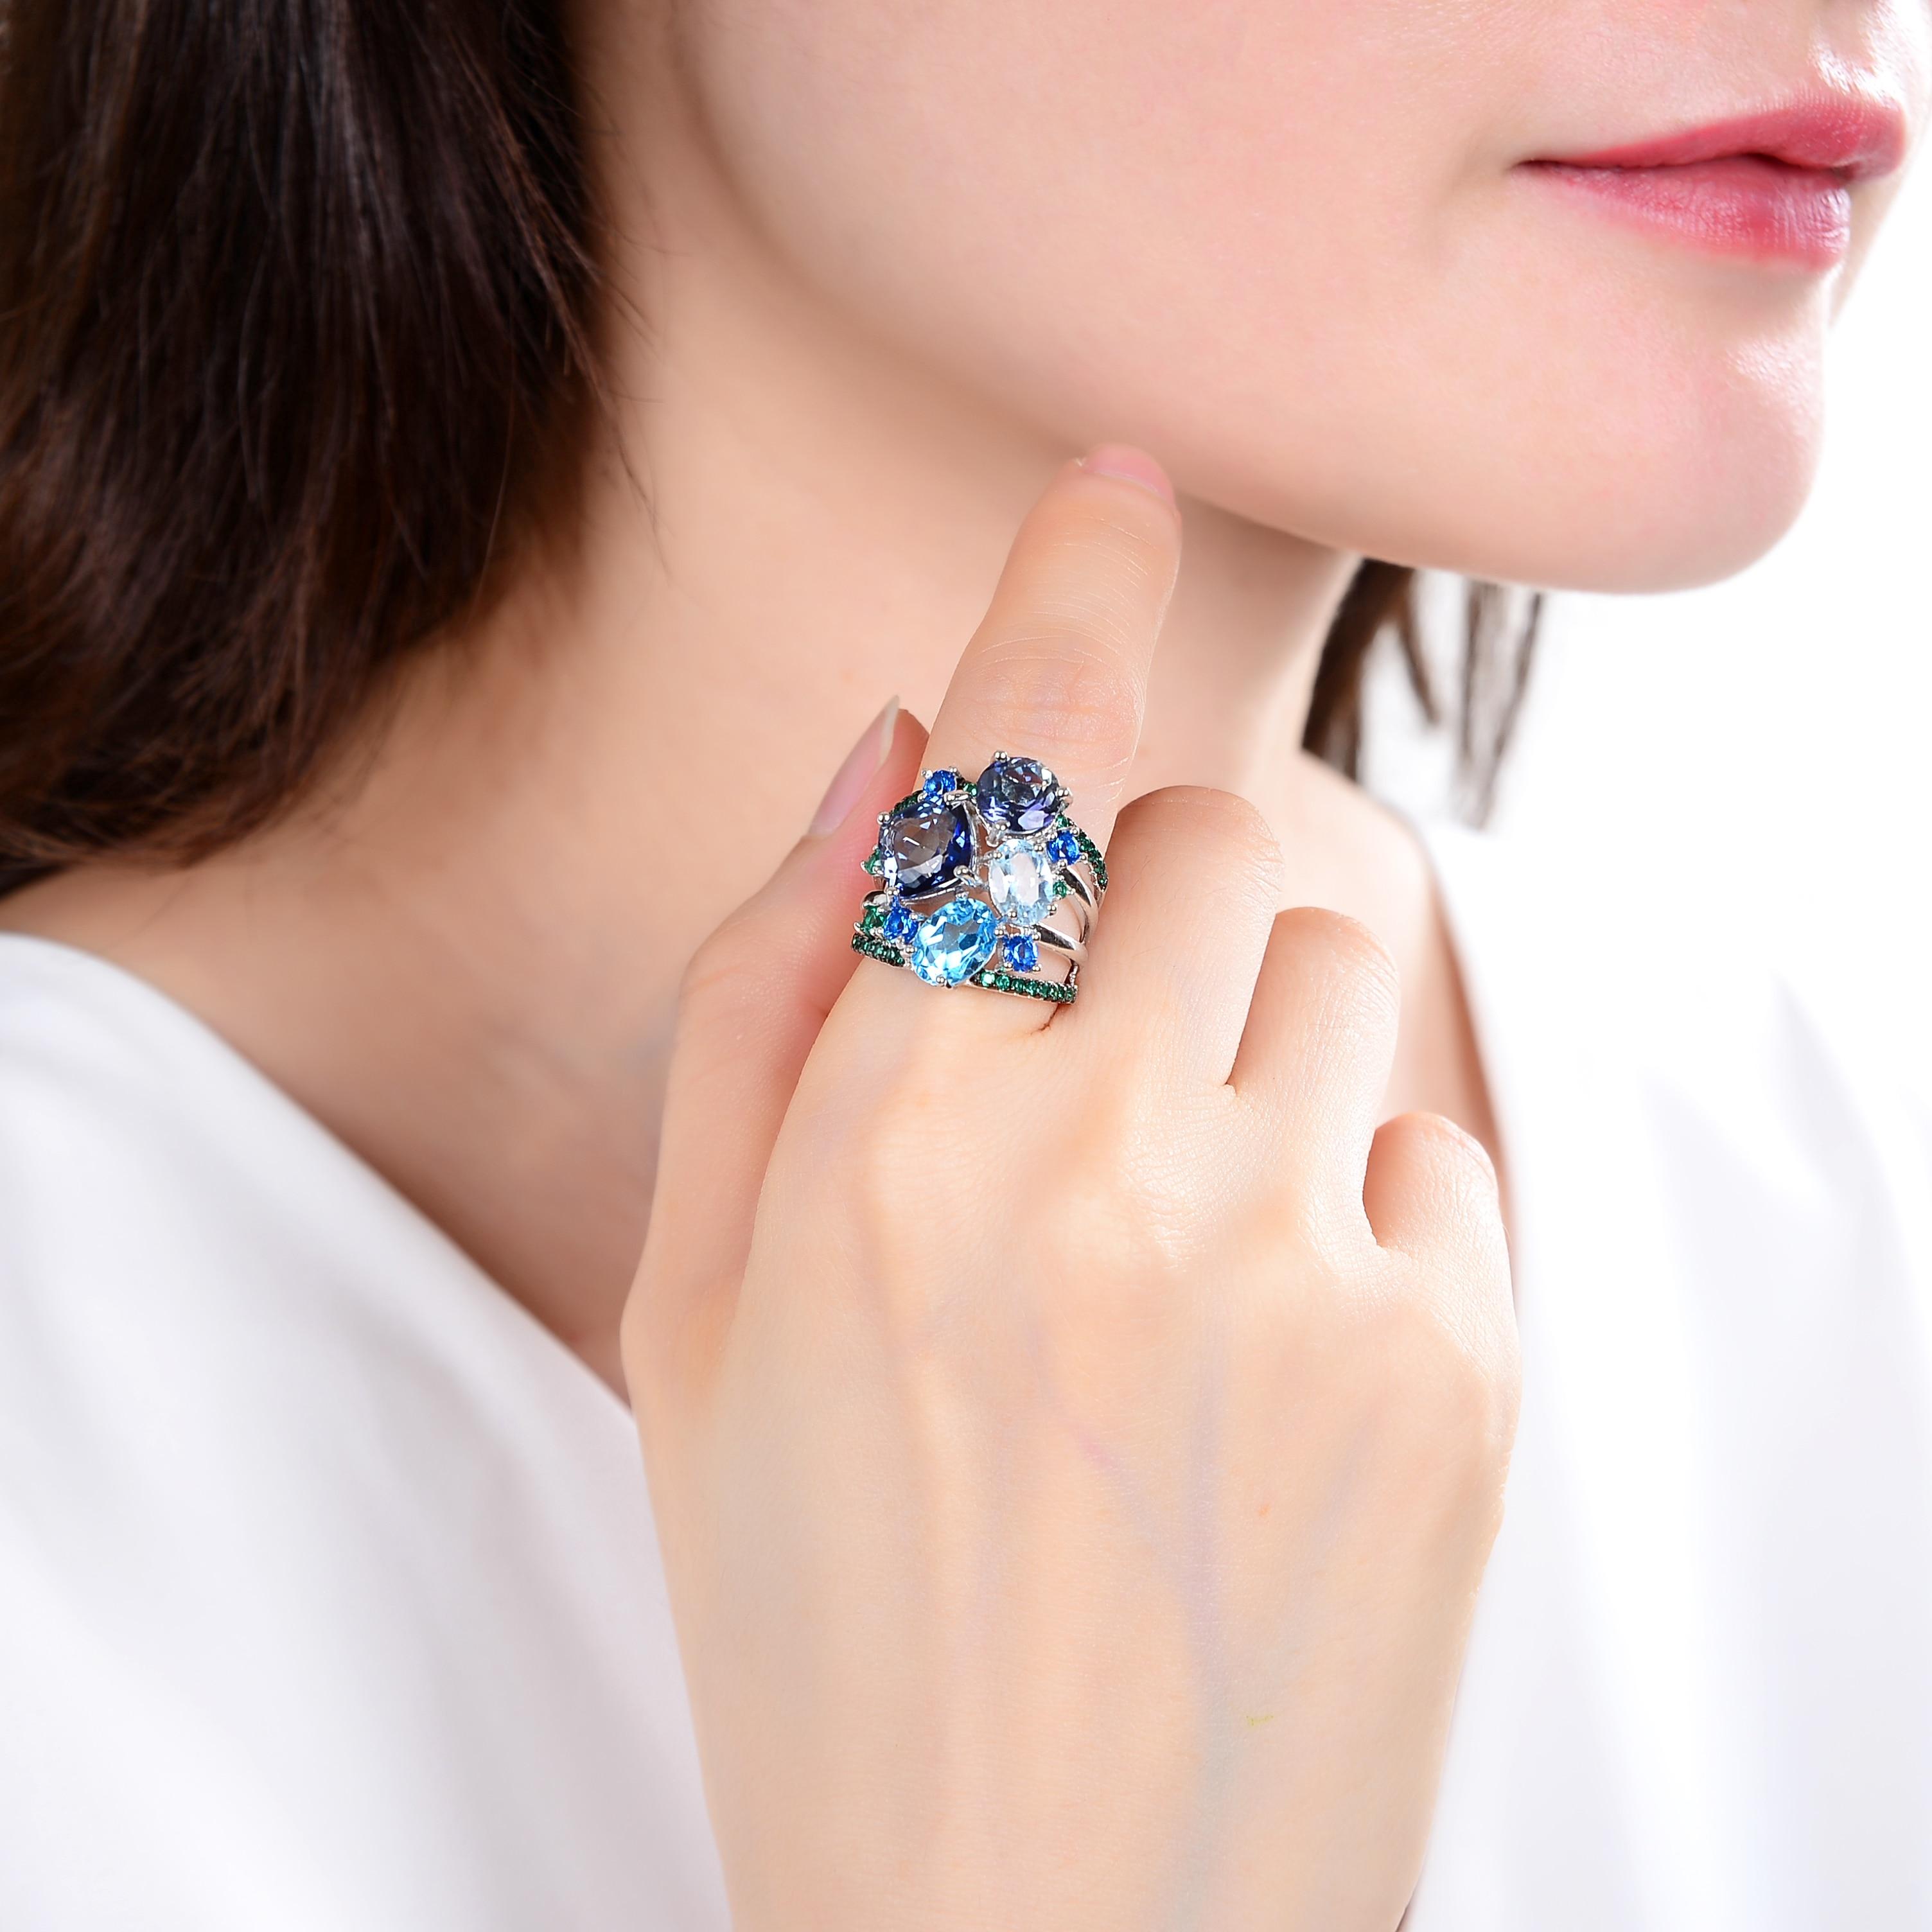 GEM'S BALLET Natural Mystic Quartz Topaz Gemstone Ring 925 Sterling Silver Geometric Statement Rings for Women Wedding Jewelry